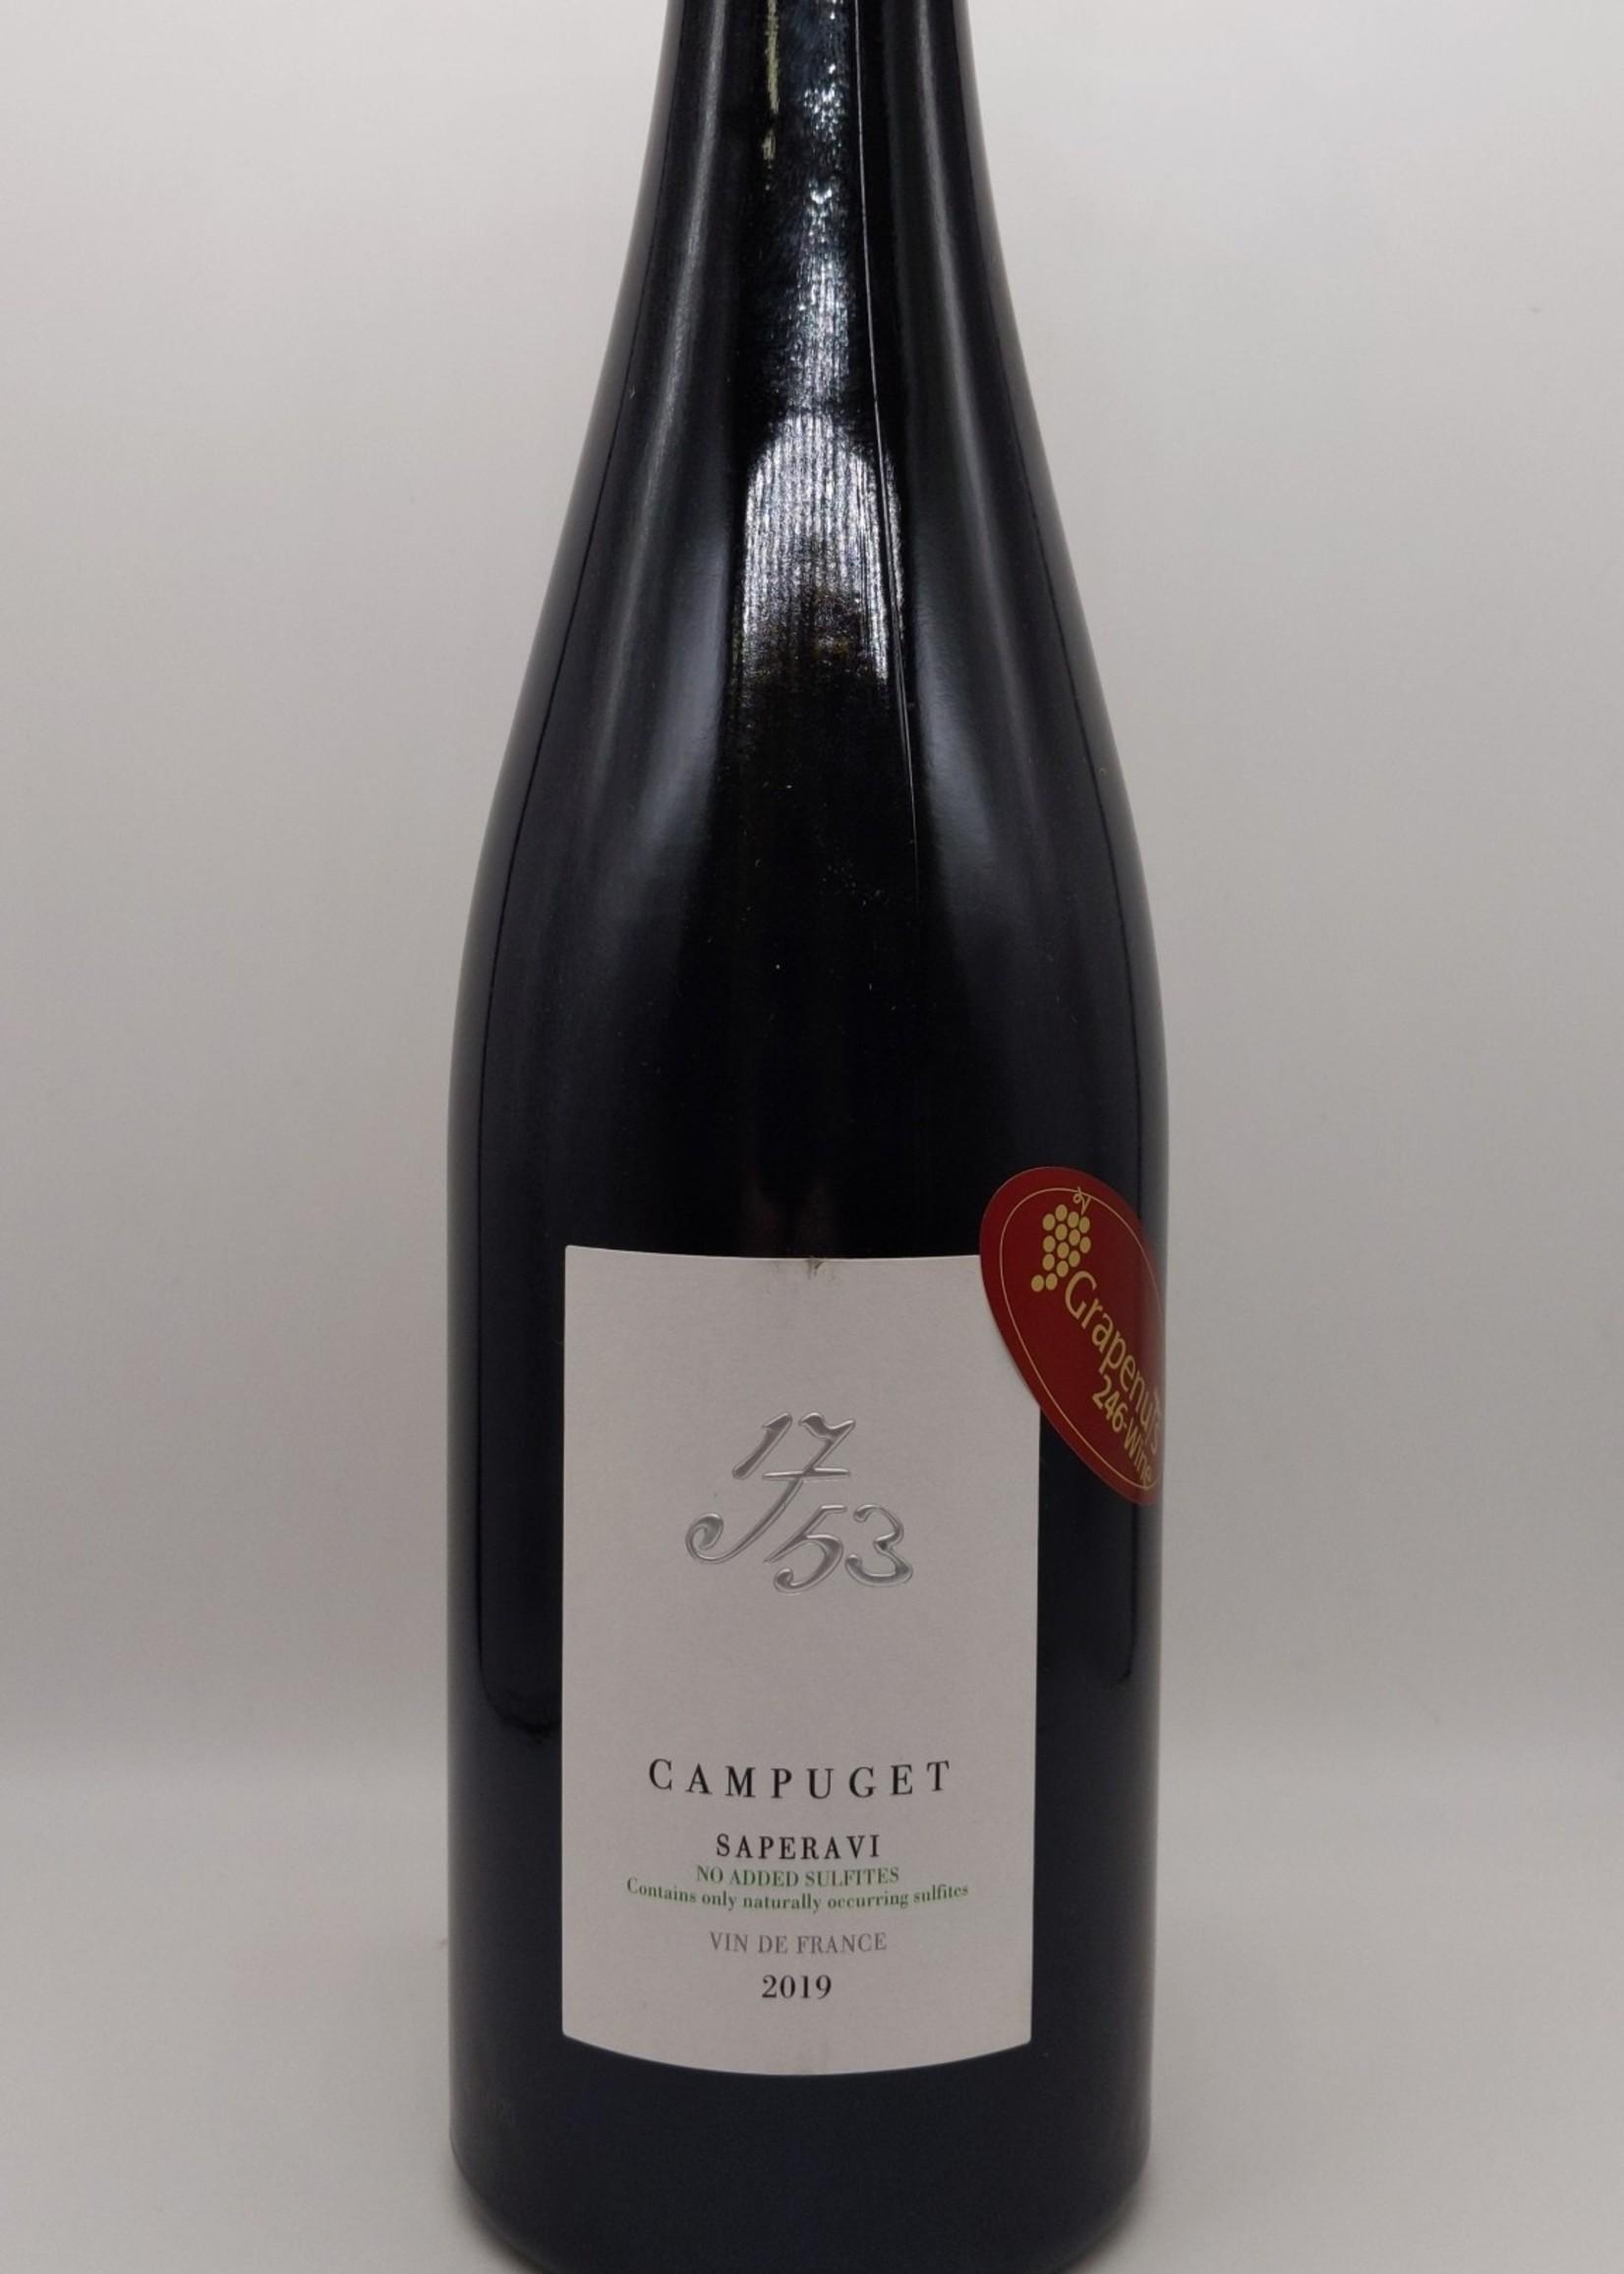 2019 CHAT CAMPUGET 1753 SAPERAVI 750 ml